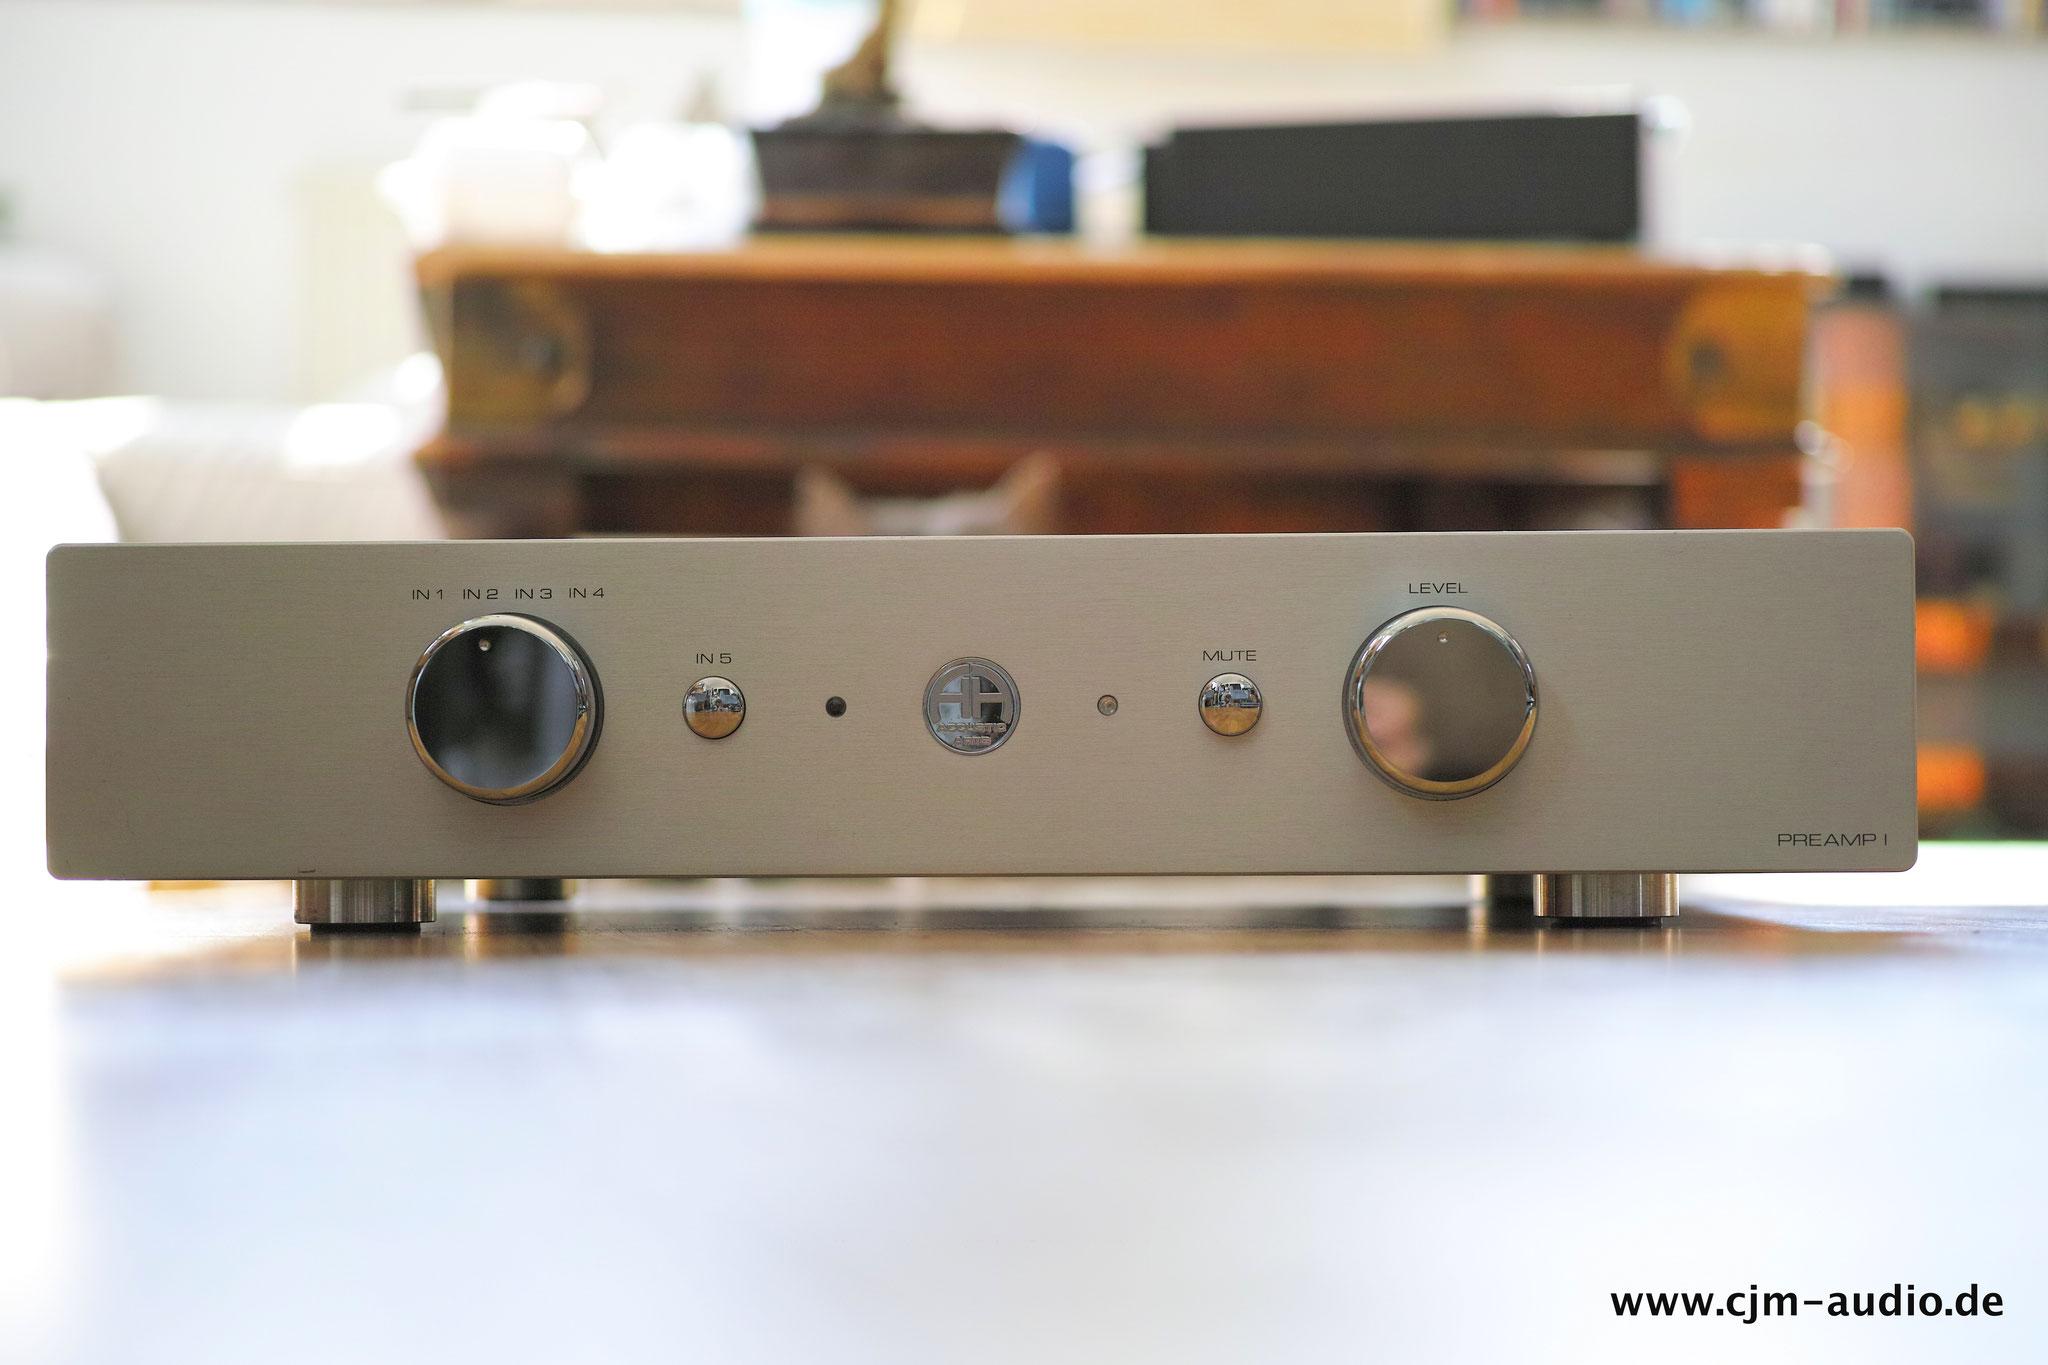 Accustic Arts Preamp 1 Balanced Mkii Cjm Audio High End Audiomarkt Line Highend Preamplifier With Ics